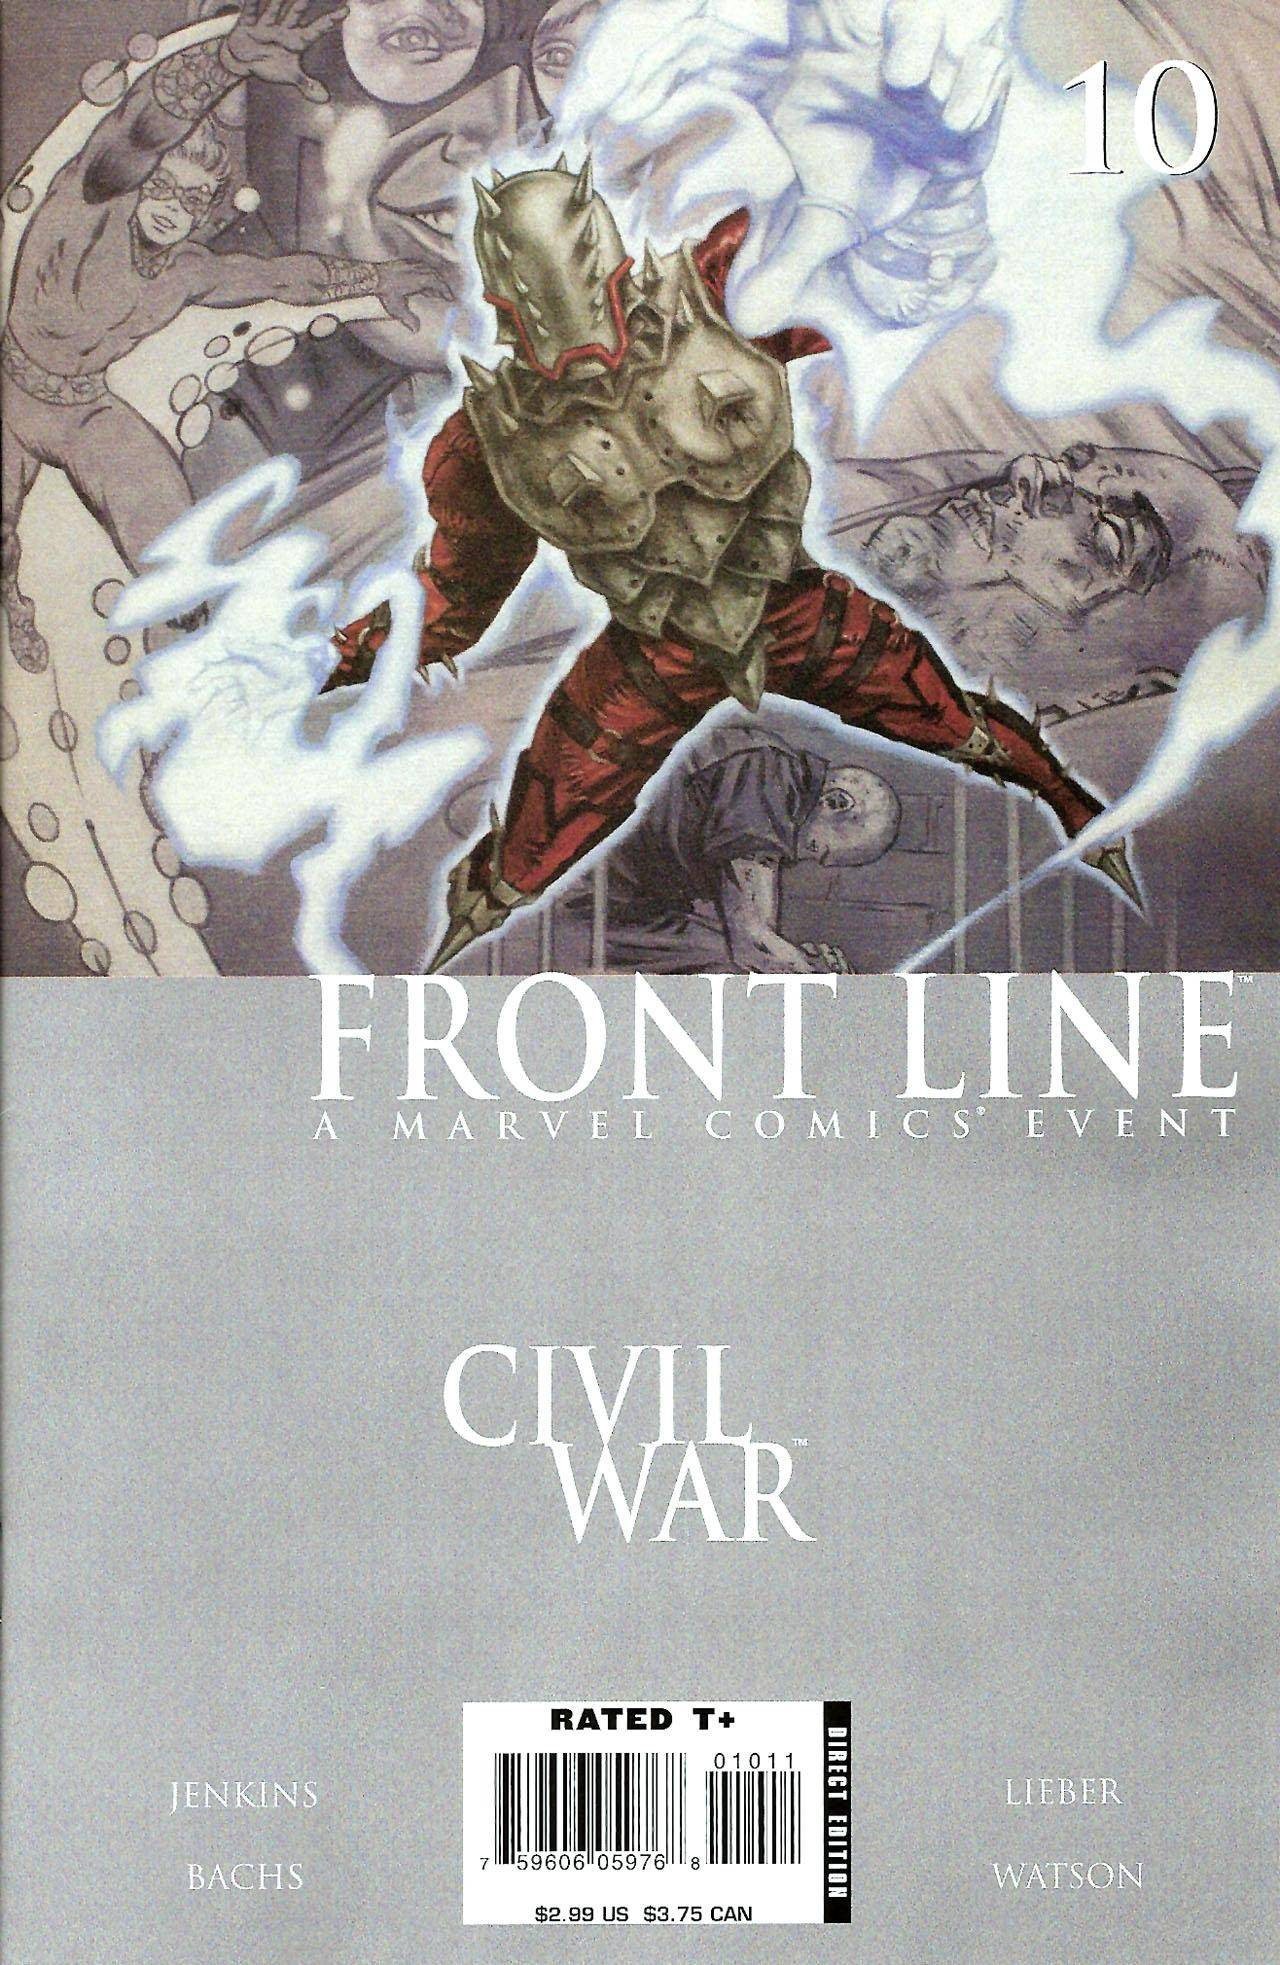 Civil War - Frontline 10